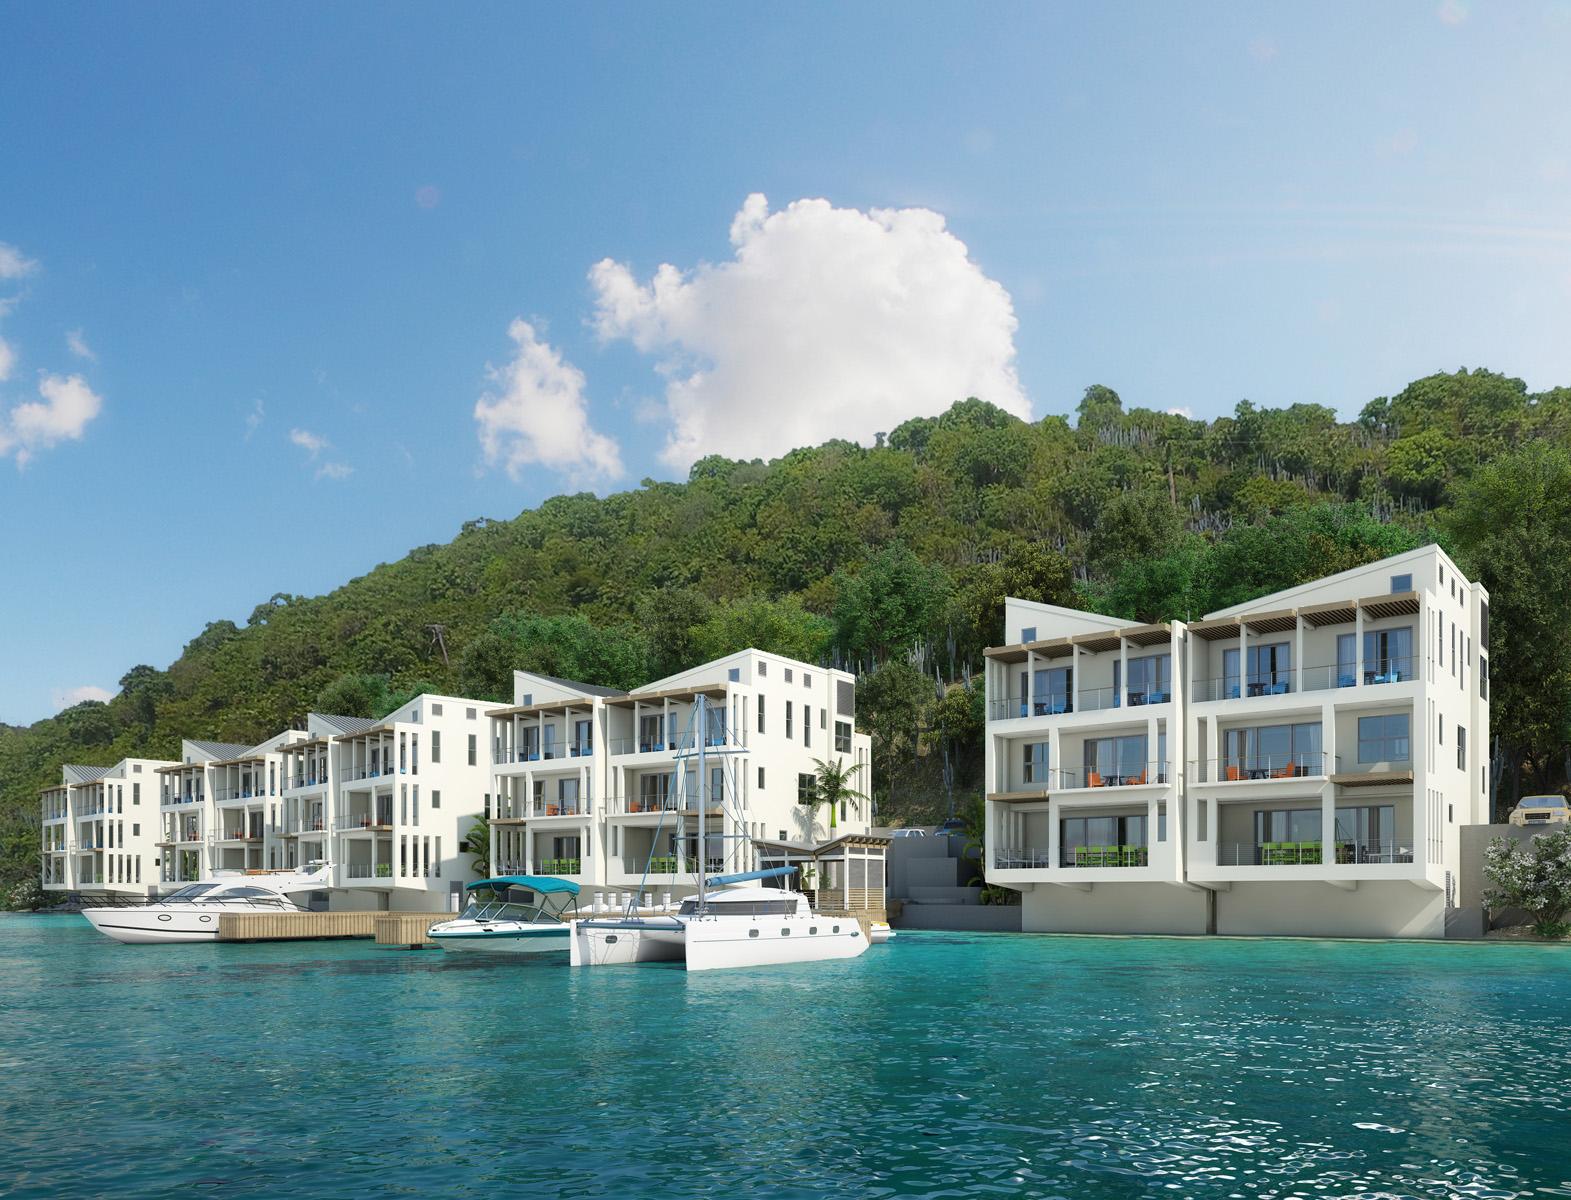 Condominium for Sale at Brandywine Bay Oceanfront Condos Other Tortola, Tortola British Virgin Islands